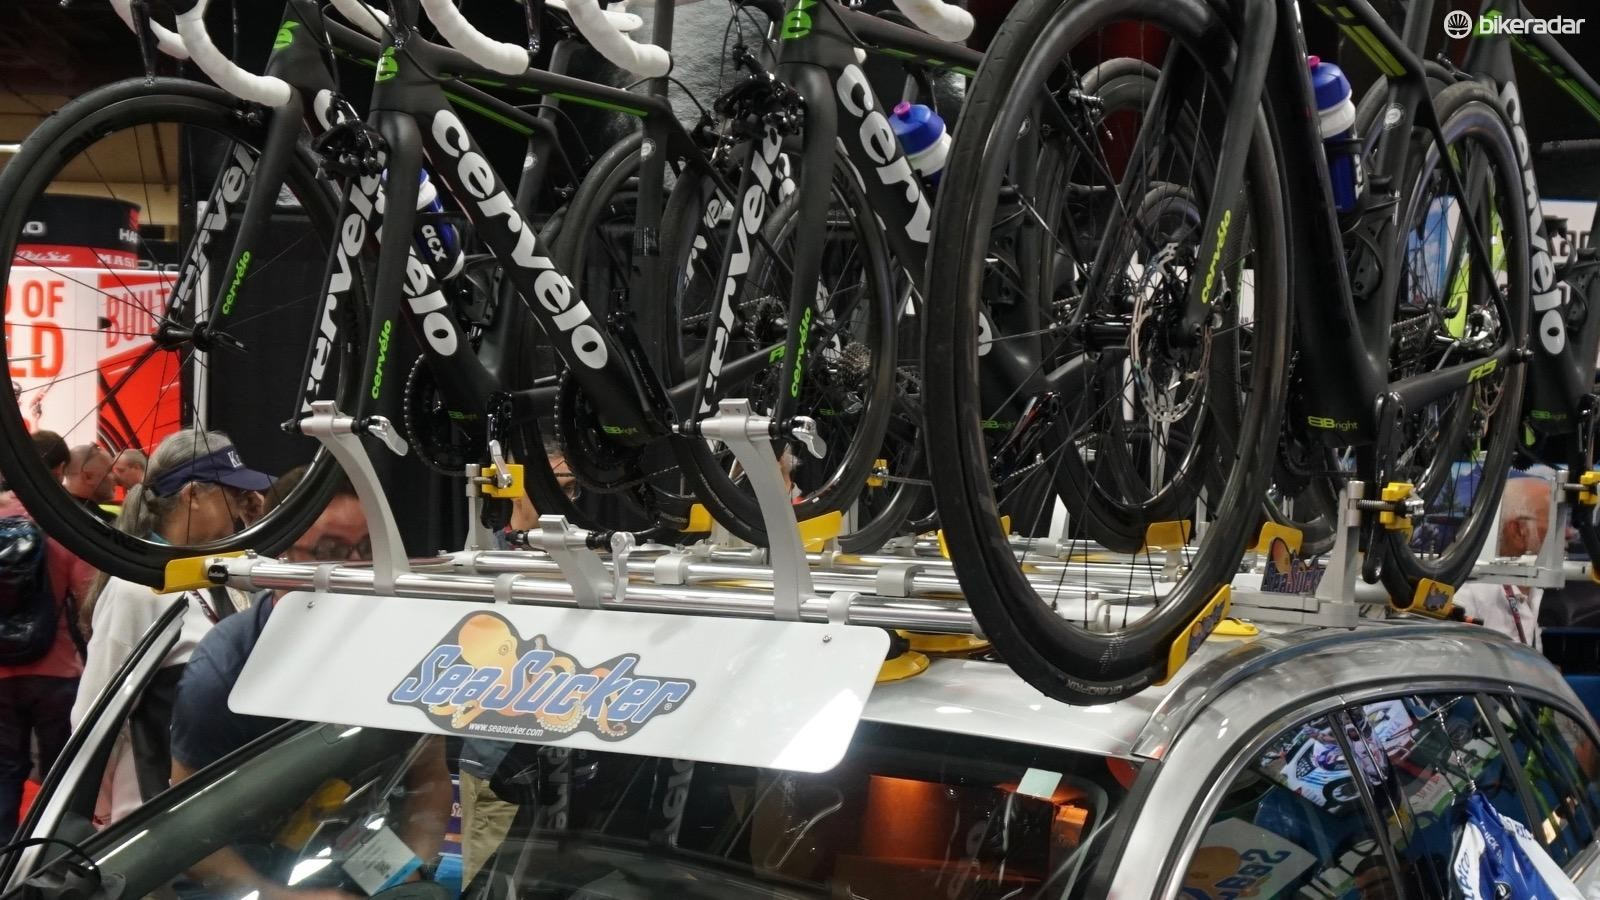 Seasucker's team rack features four ready-to-ride bikes, plus five bikes with fork mounts